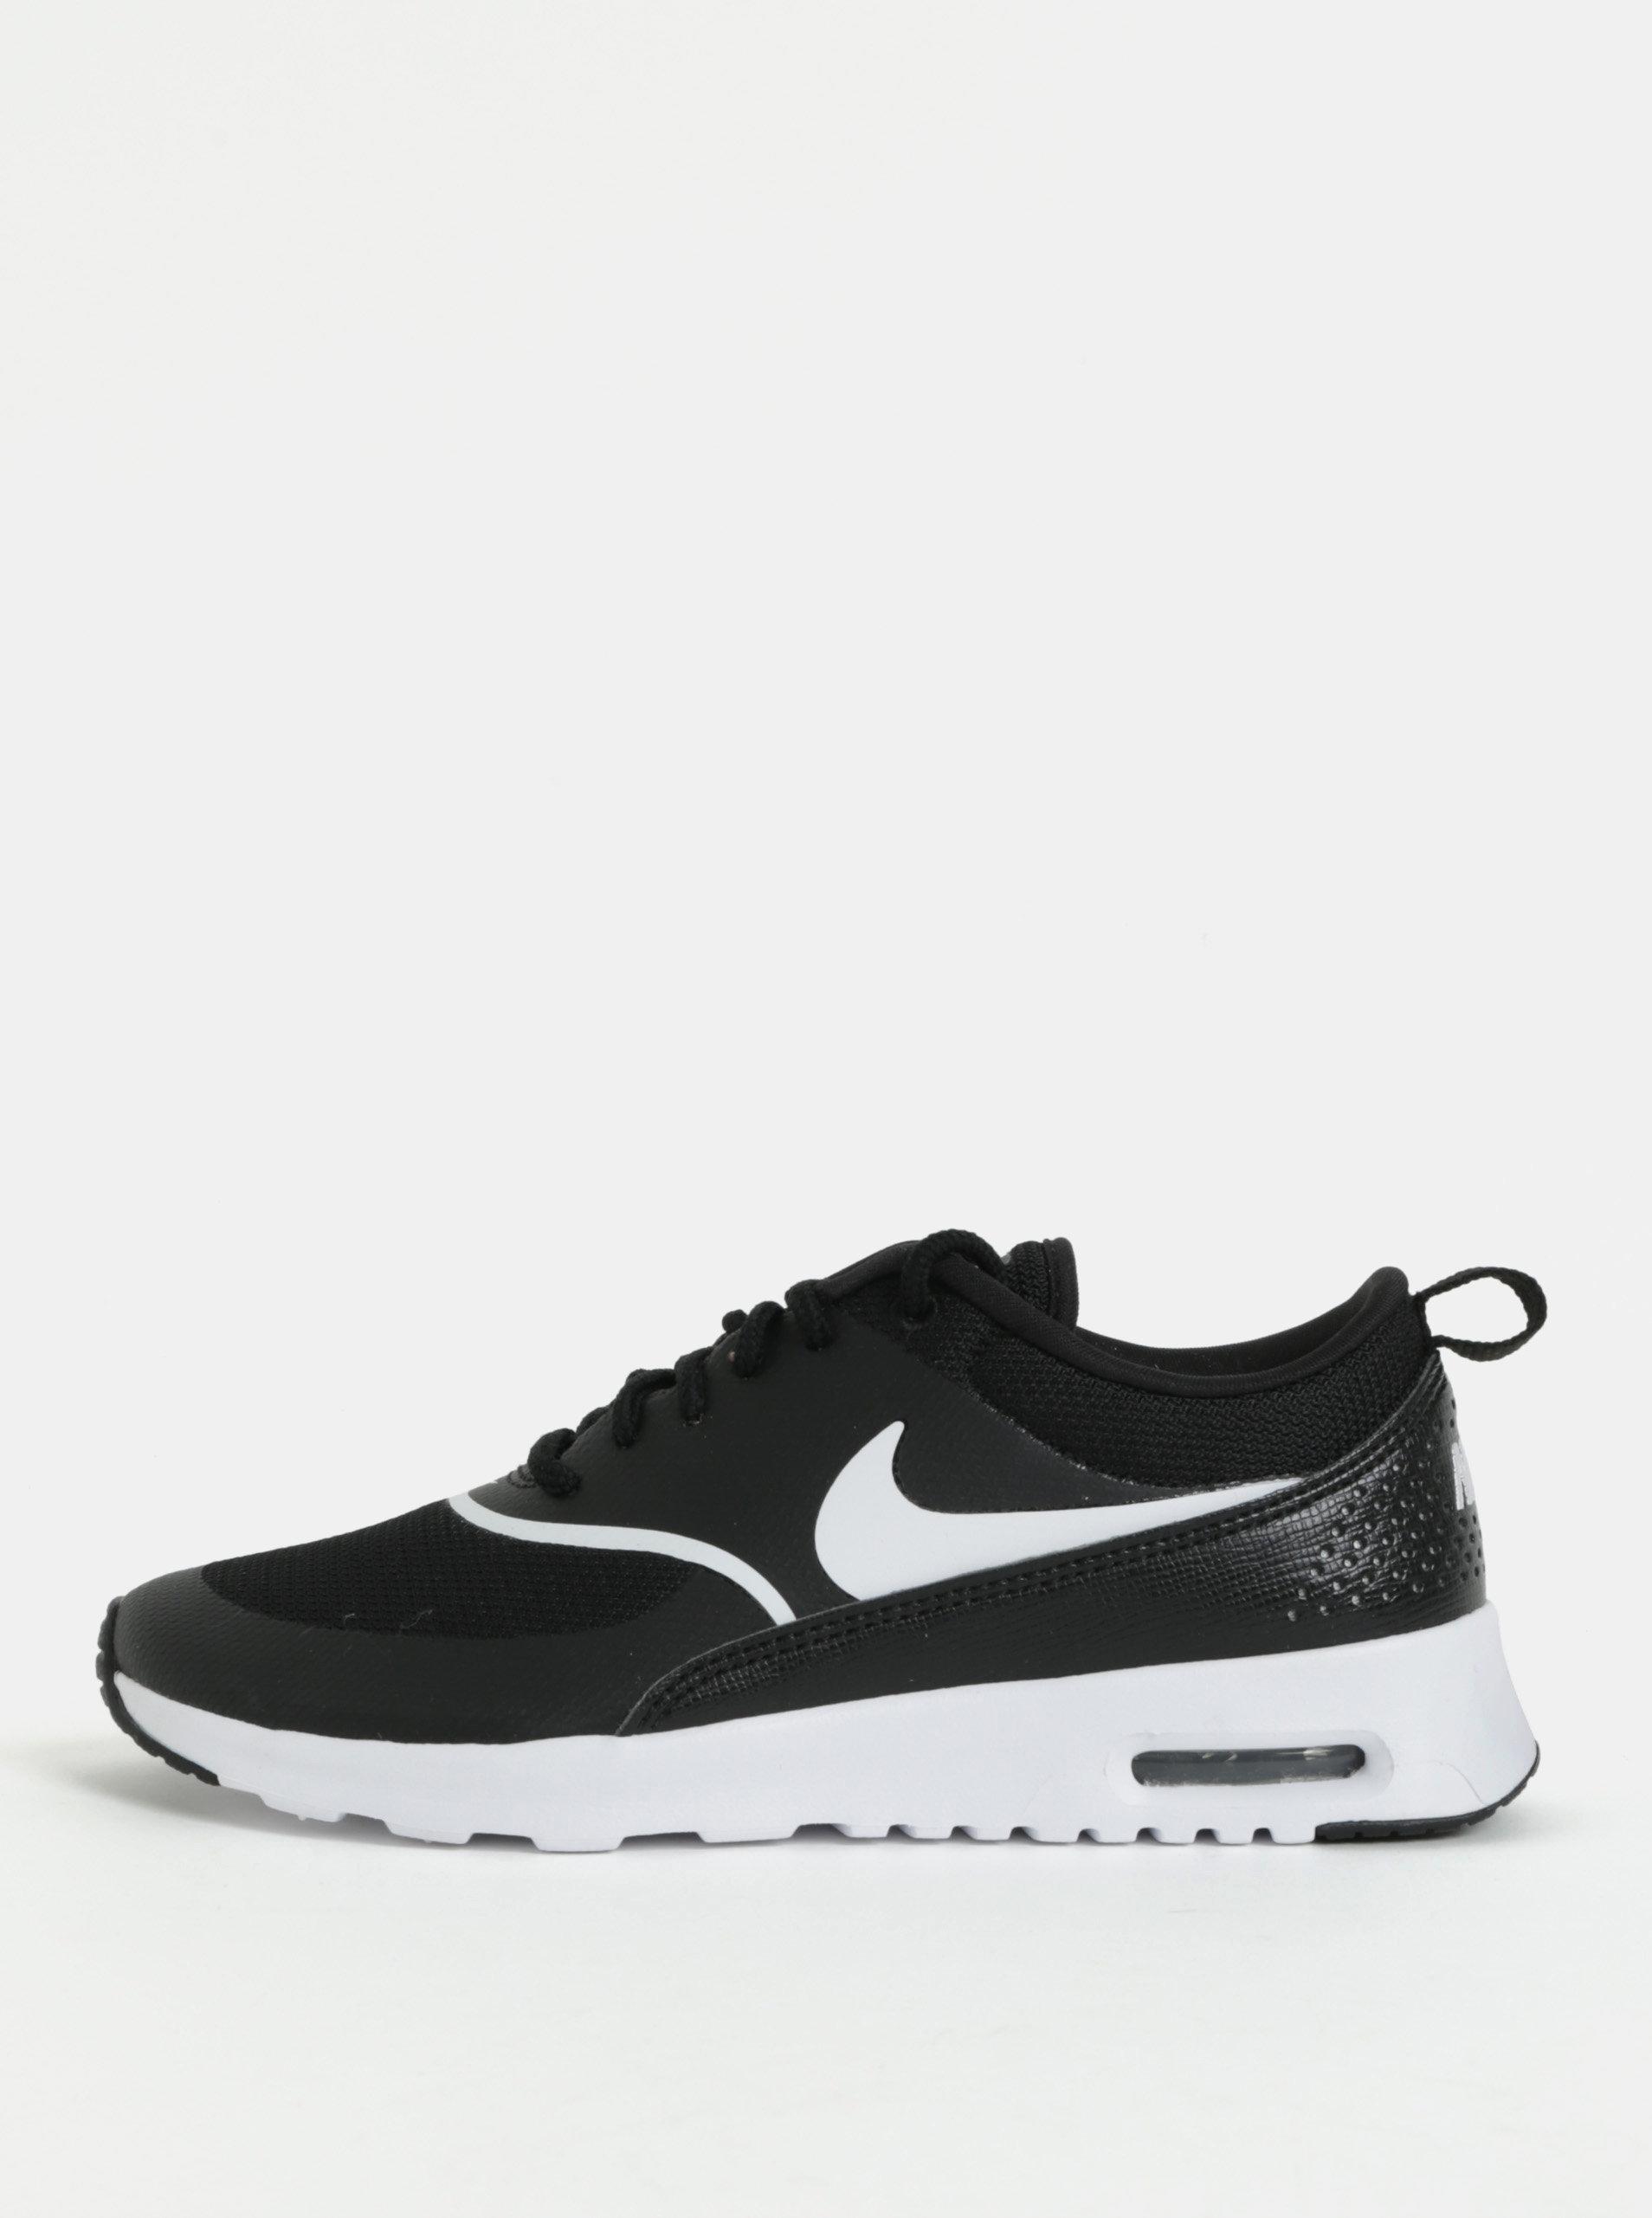 05cb33dd1f6c Čierne dámske tenisky Nike Air Max Thea ...